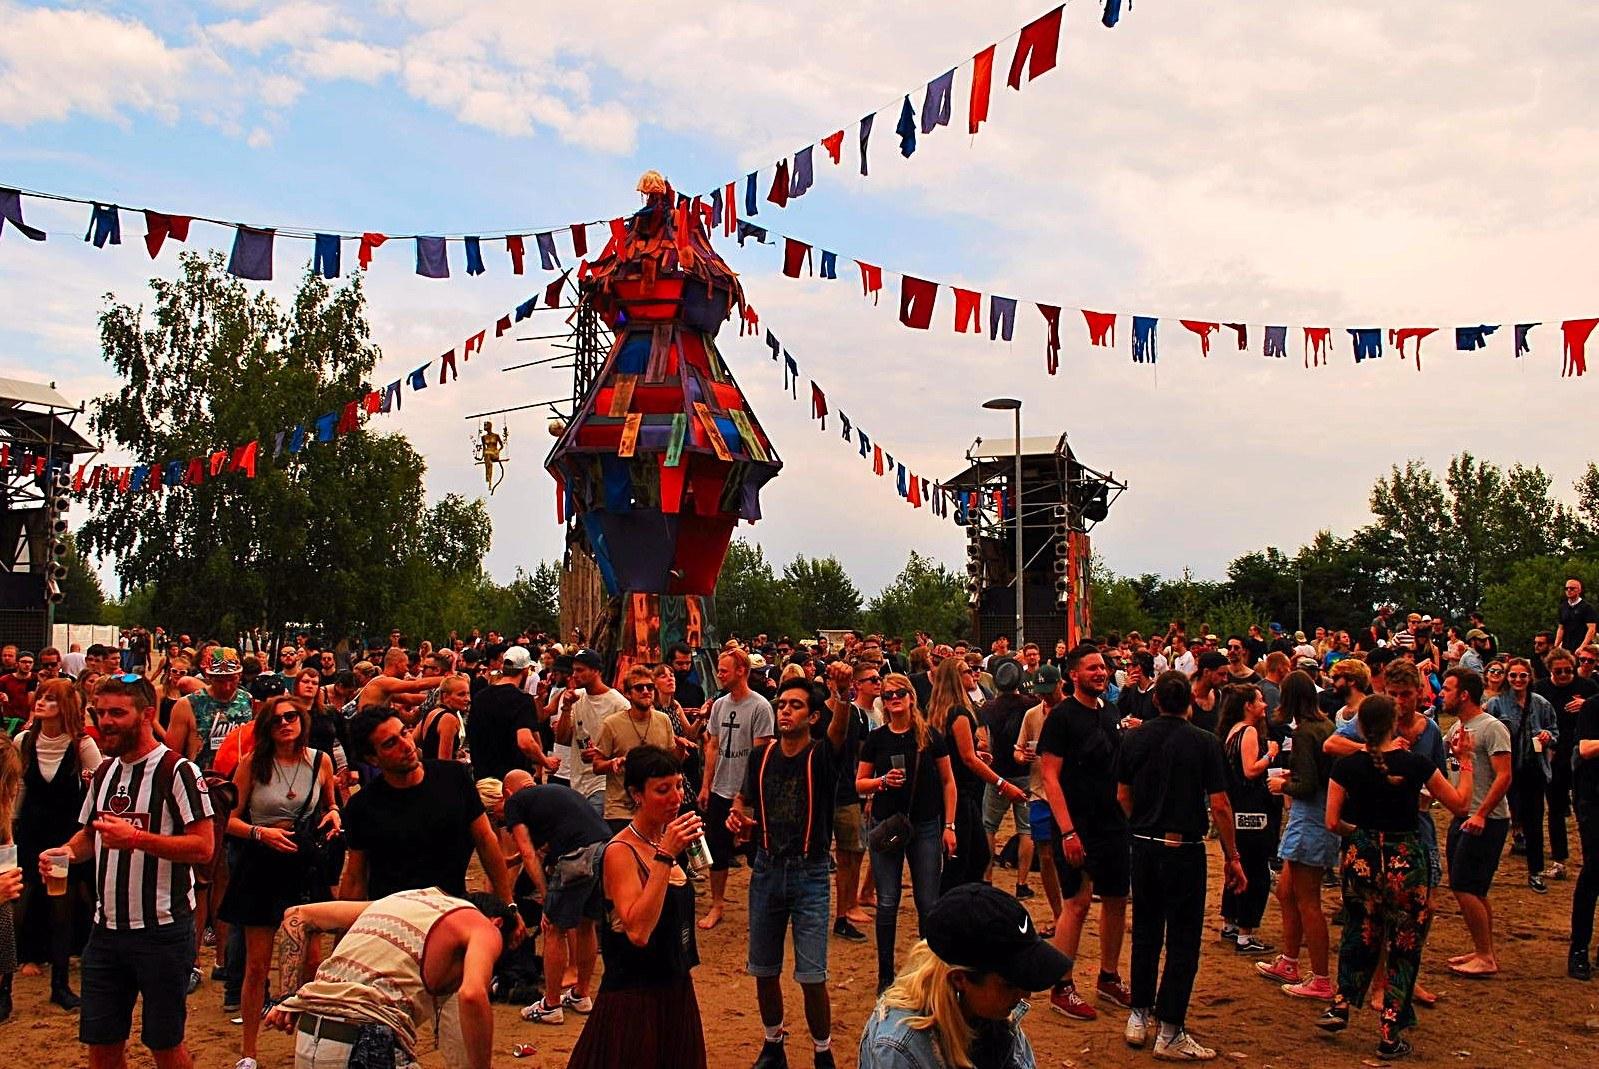 Sleepless Floor @ MELT Festival 2017 - Fotocredits: Djuna Vaesen